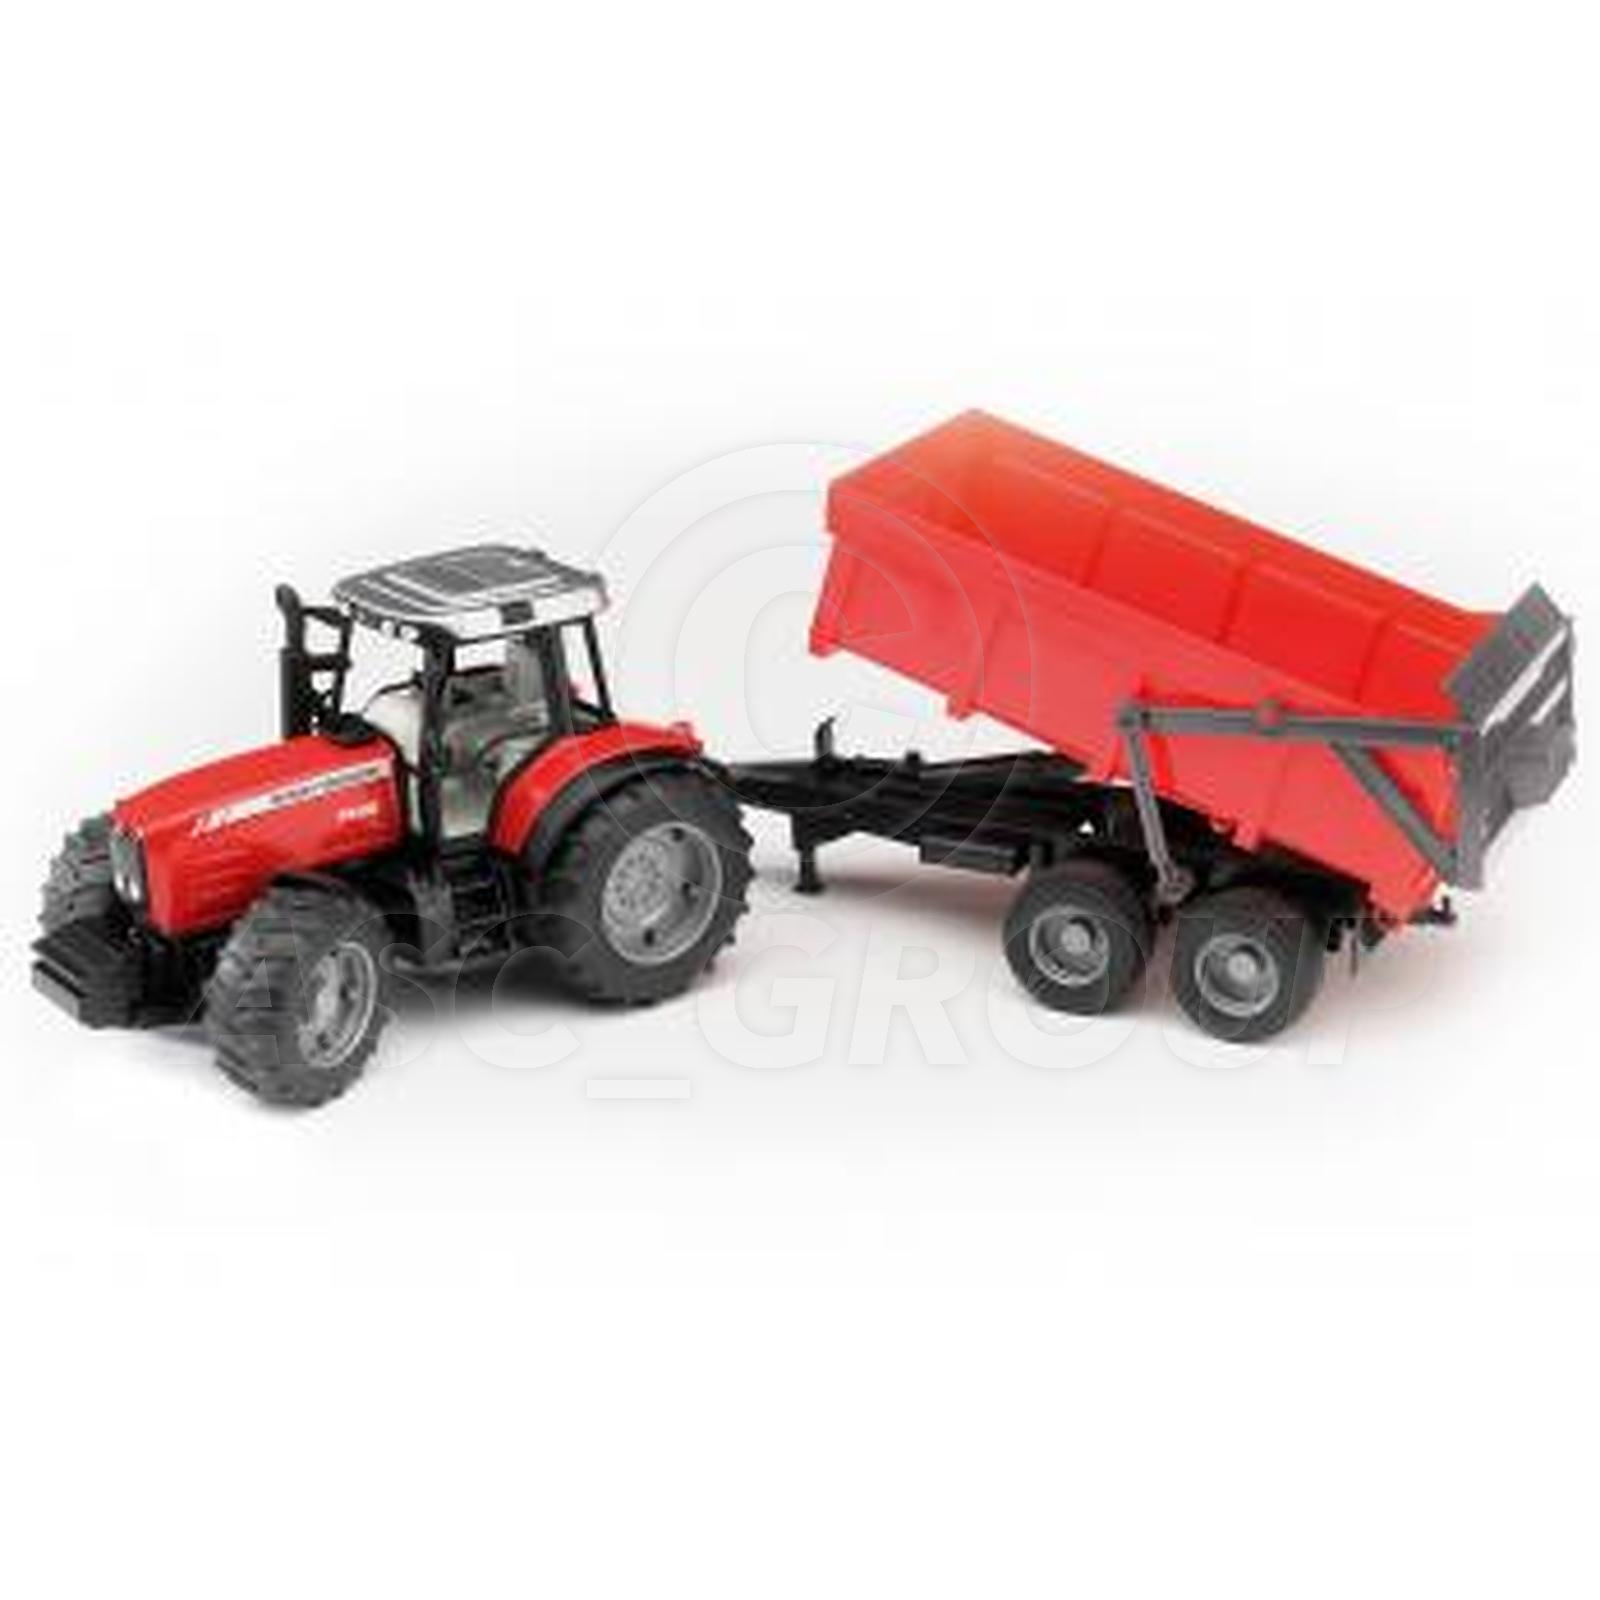 Bruder Toys 02045 Pro Series MASSEY FERGUSON 7480 Tractor & Tipping Trailer 1 16